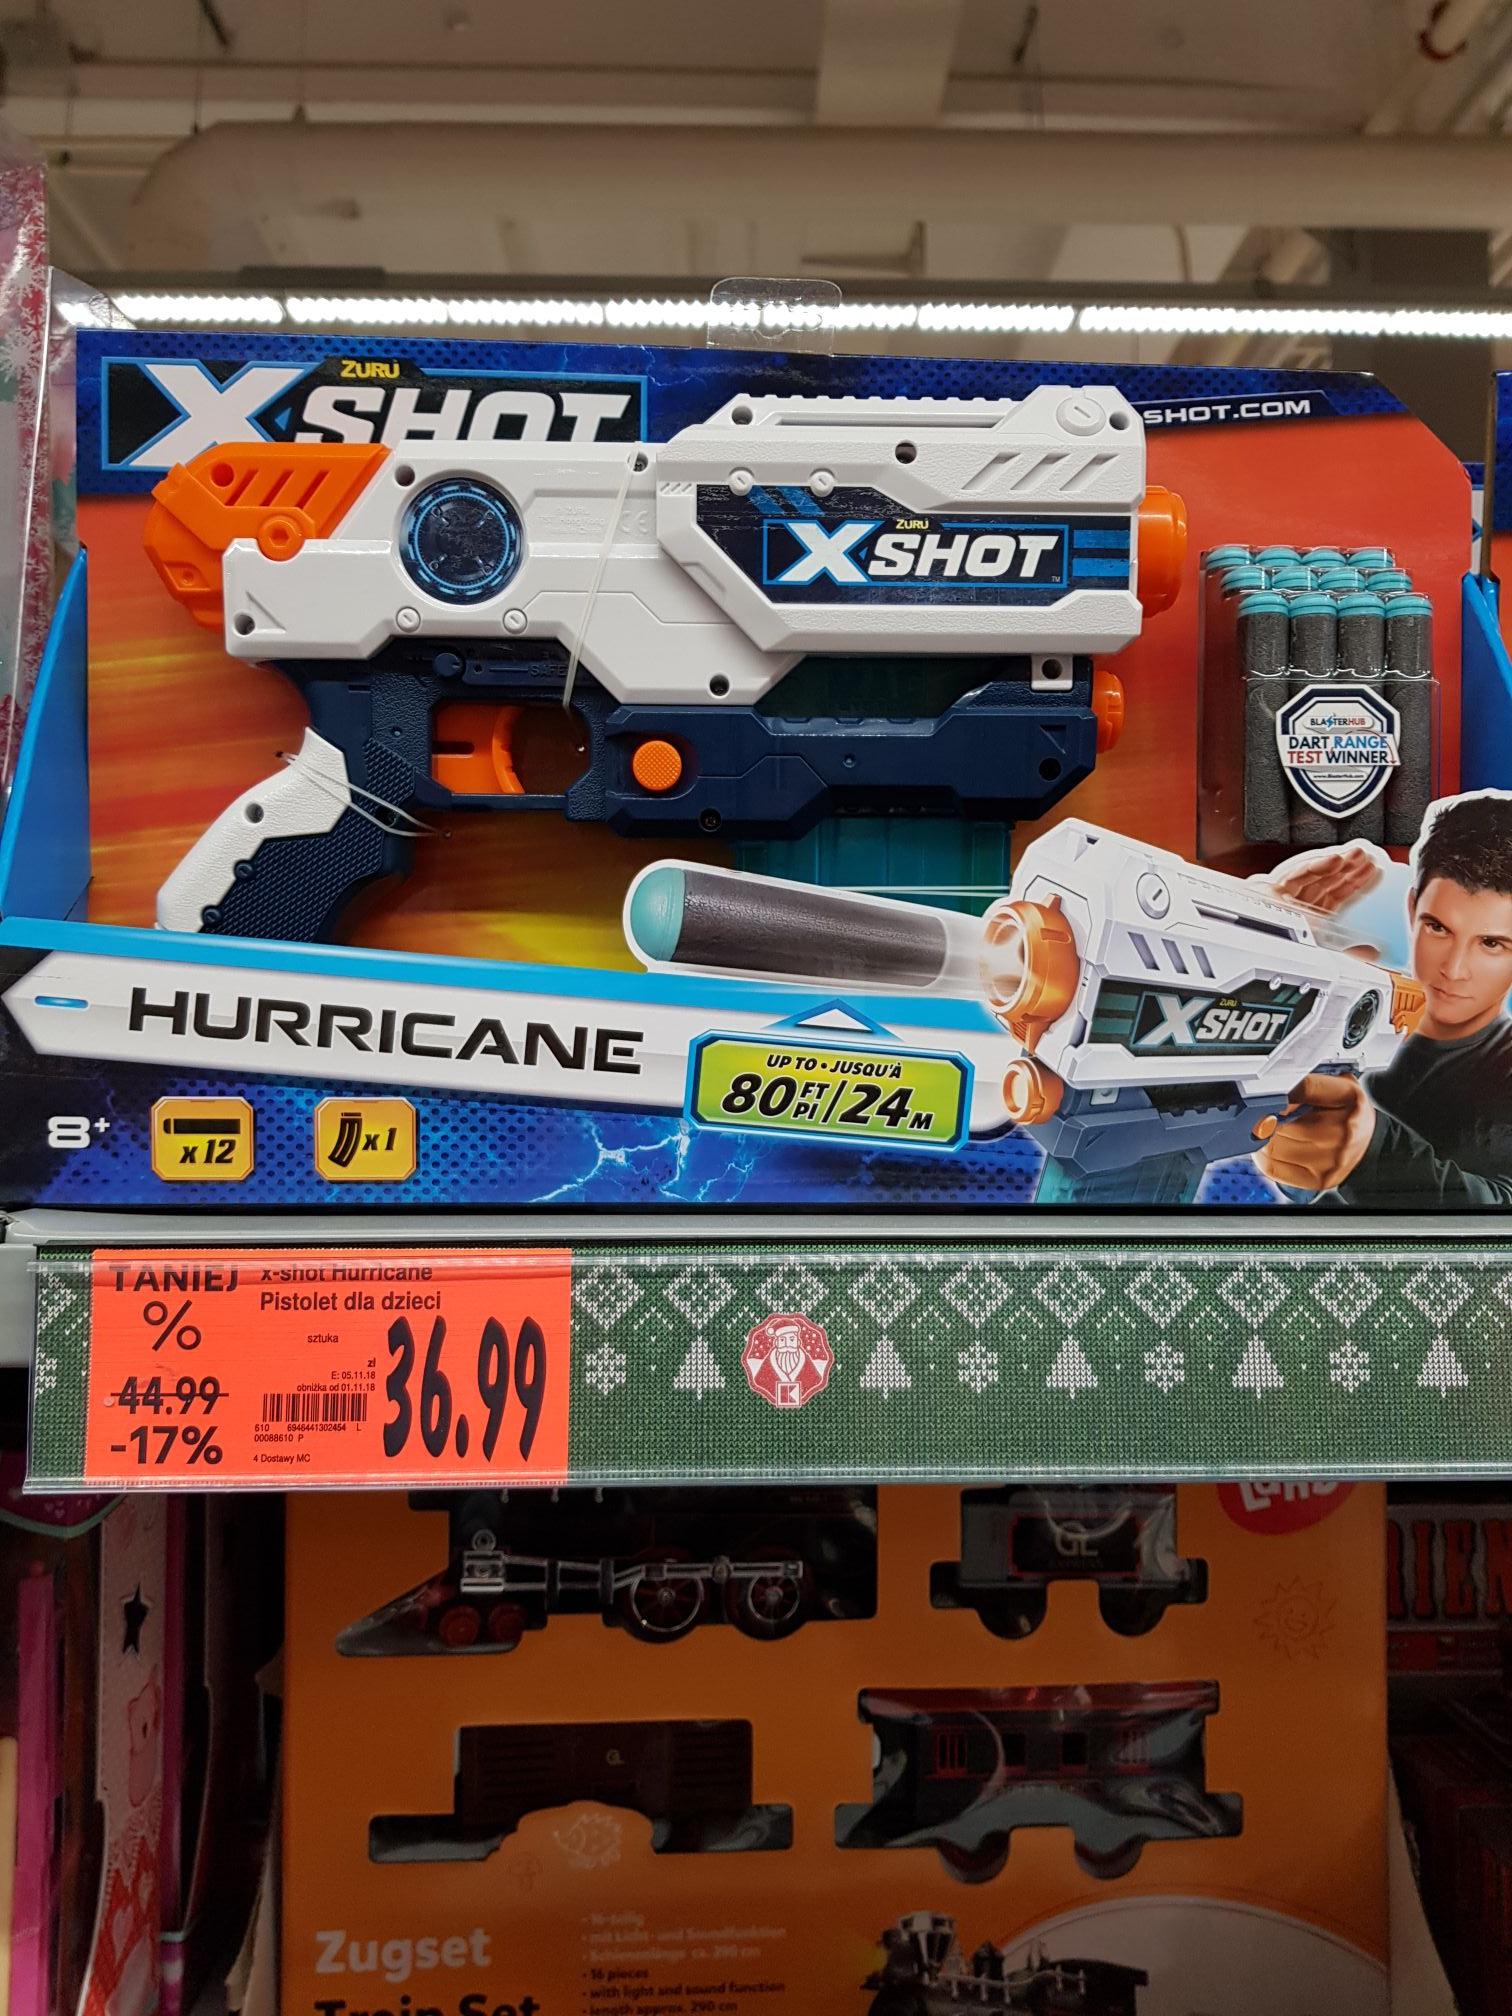 X-shot hurricane - Kaufland